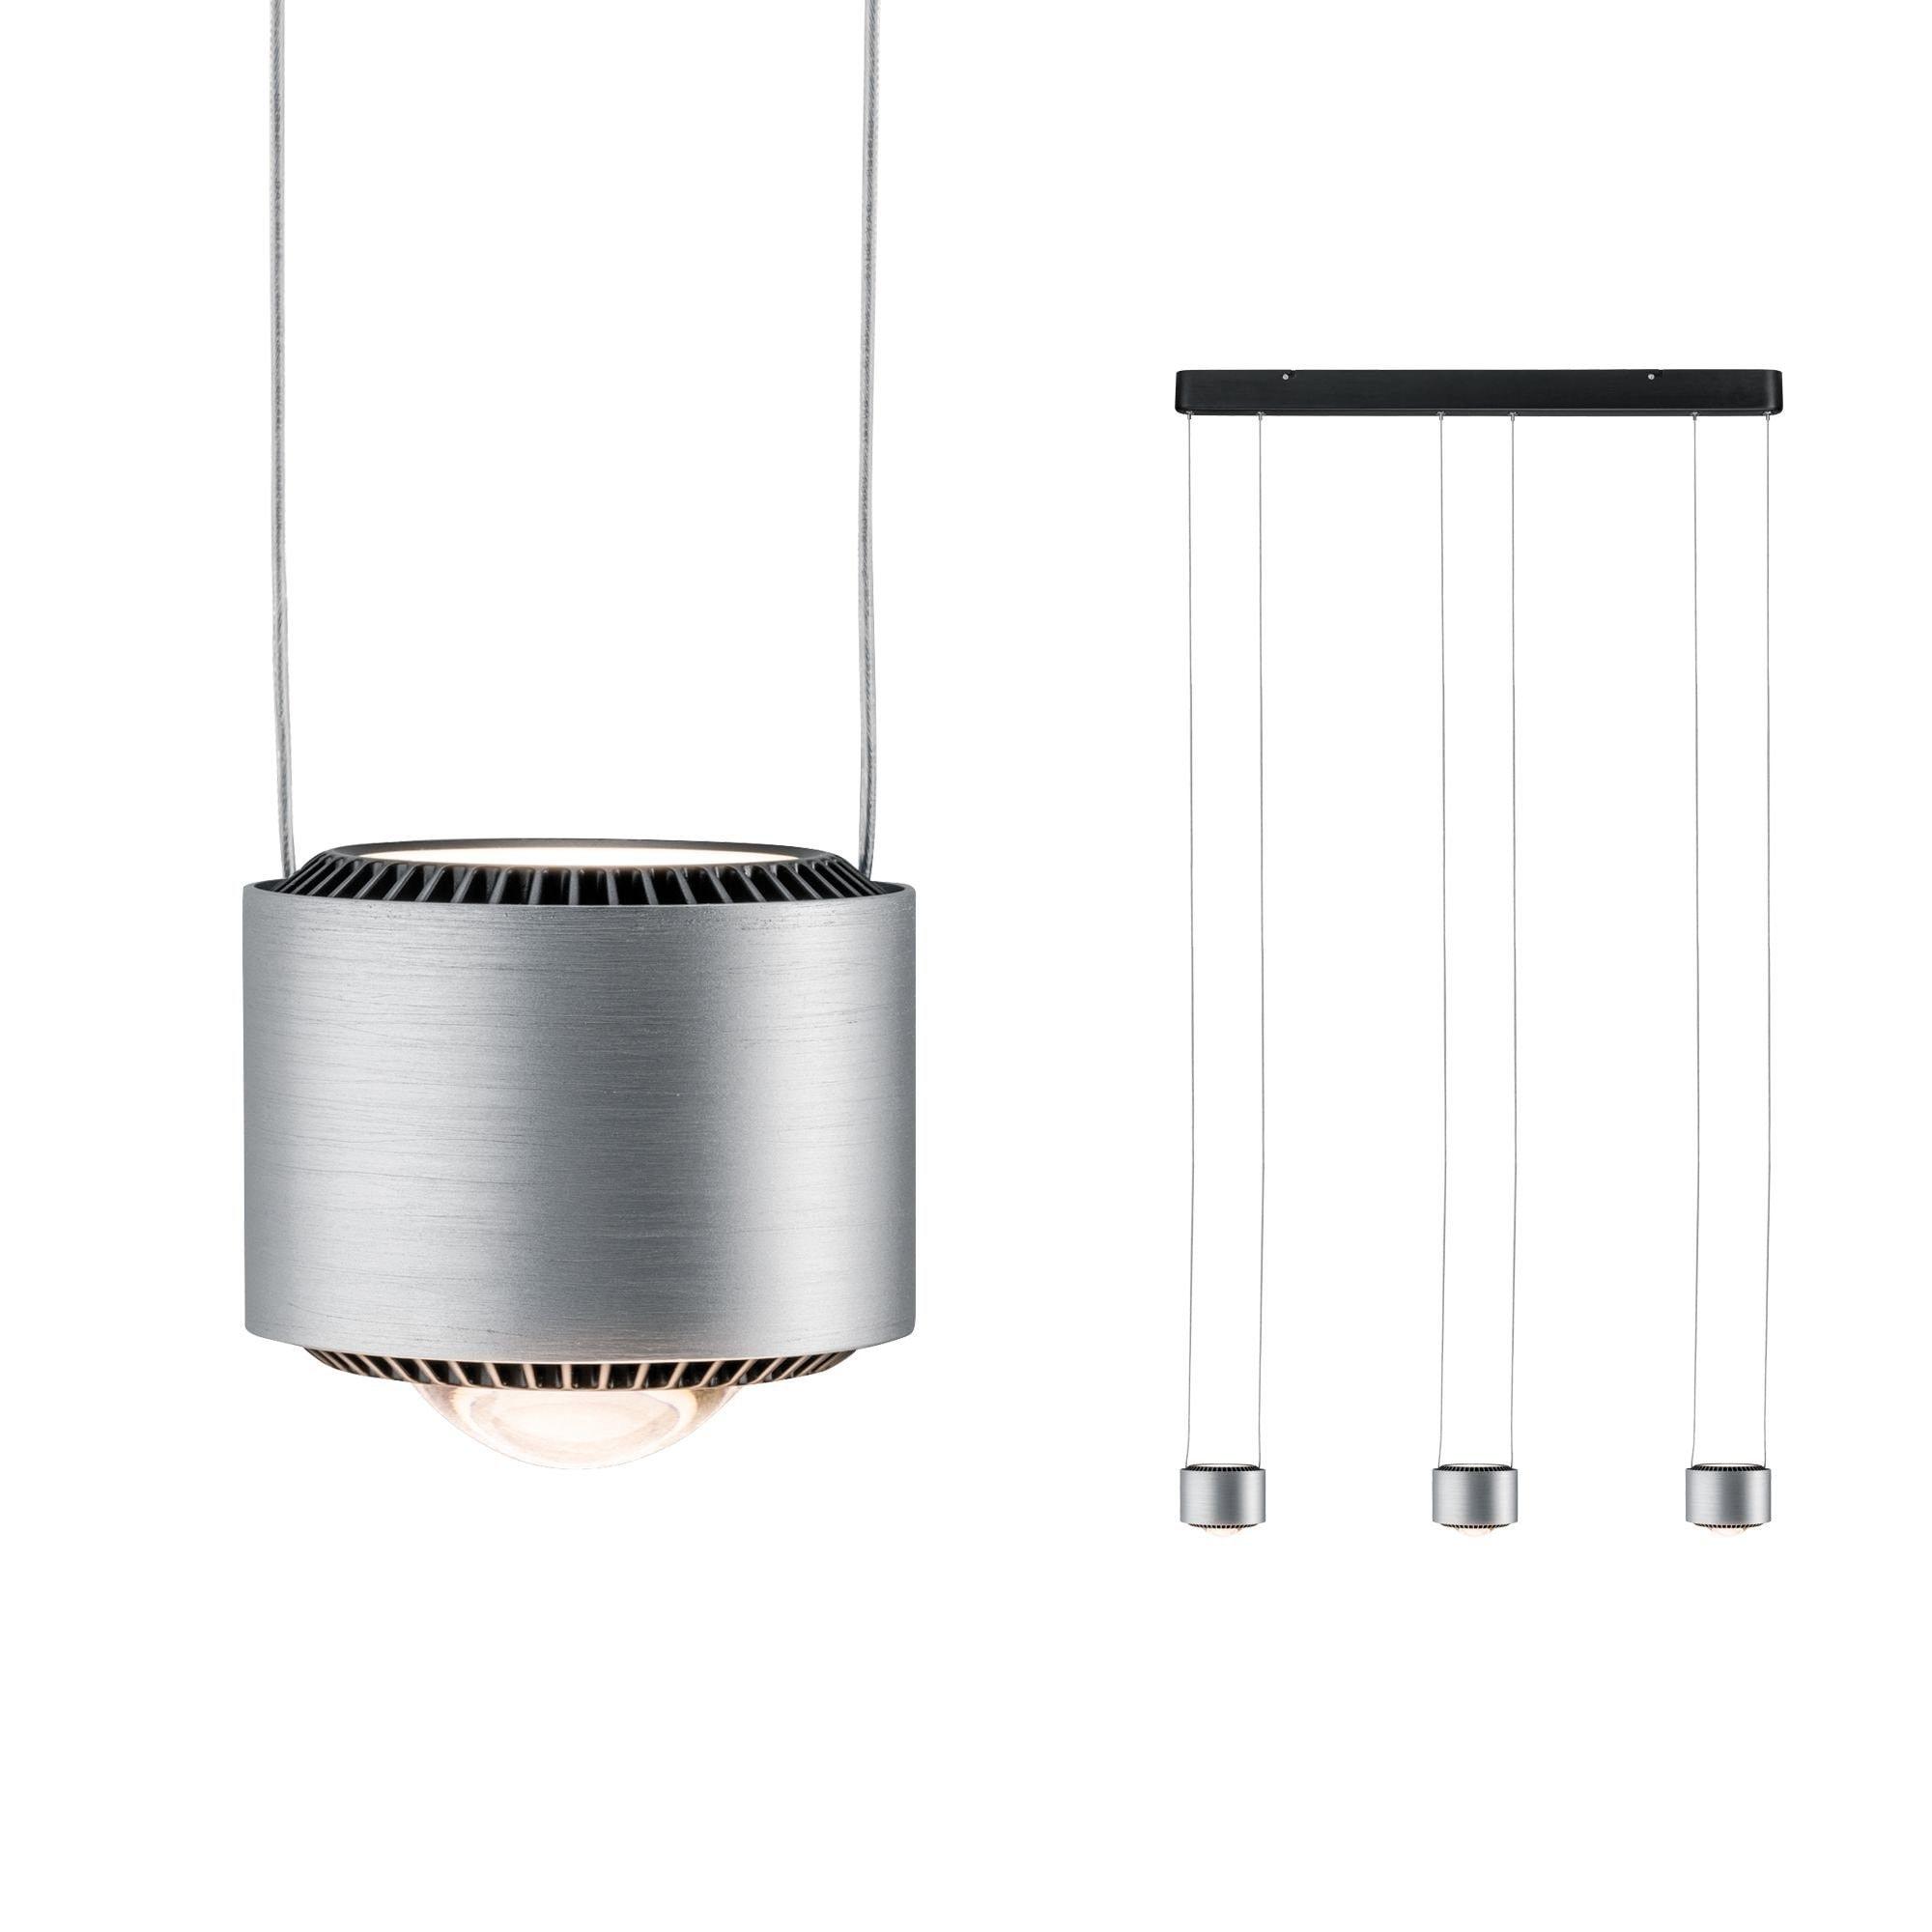 Paulmann LED Pendelleuchte Aldan 3x9W Schwarz/Alu gebürstet dimmbar, 1 St., Warmweiß